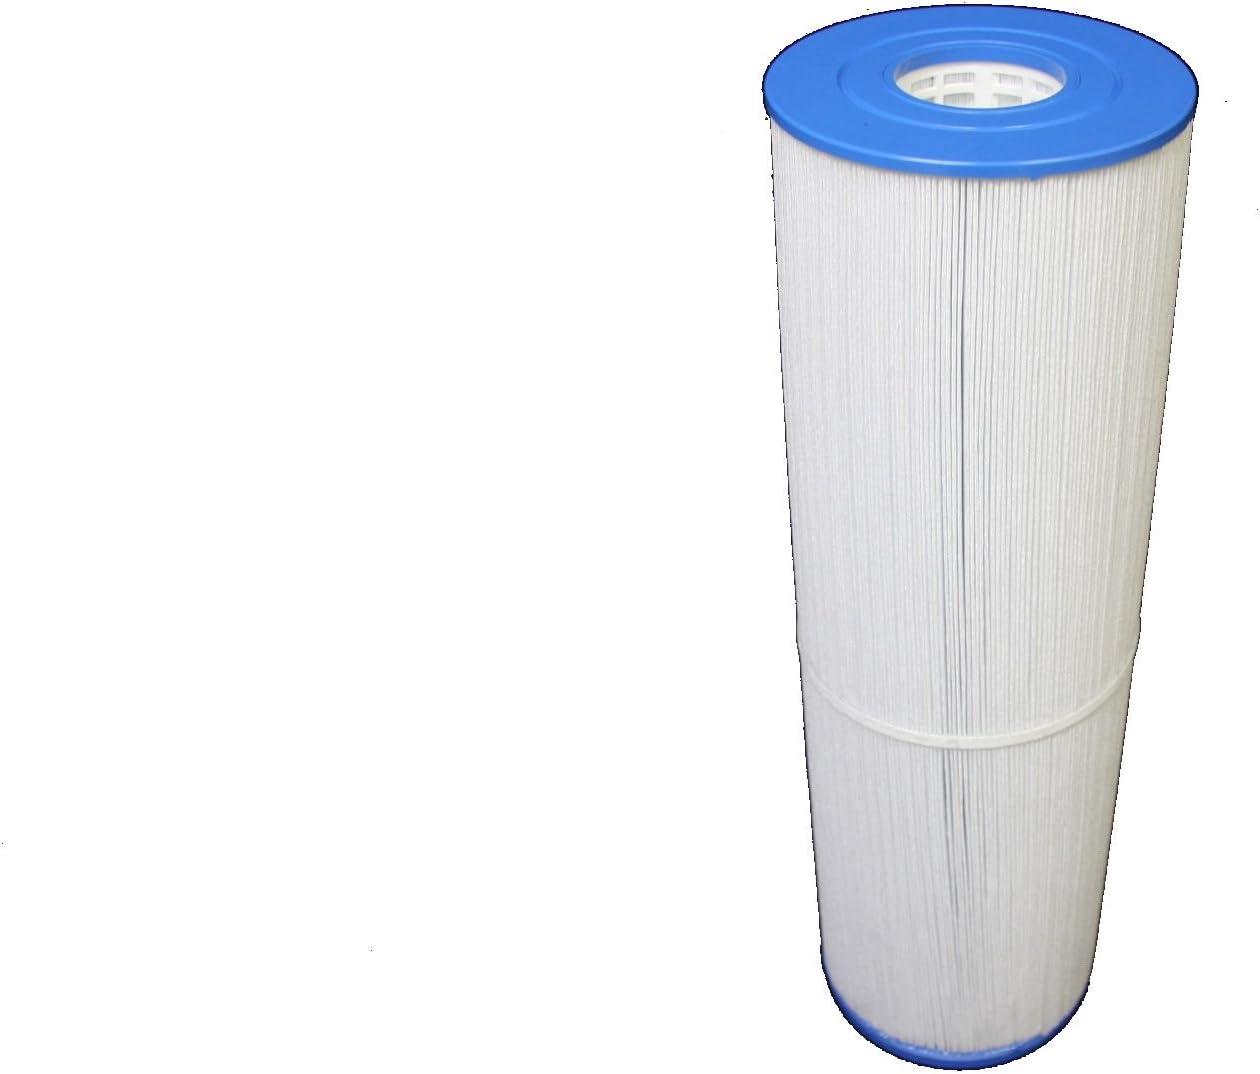 Guardian Pool Spa Filter Replaces C5397 Unicel C-5397 FC-2972 PlbS100 Rainbow Plastics